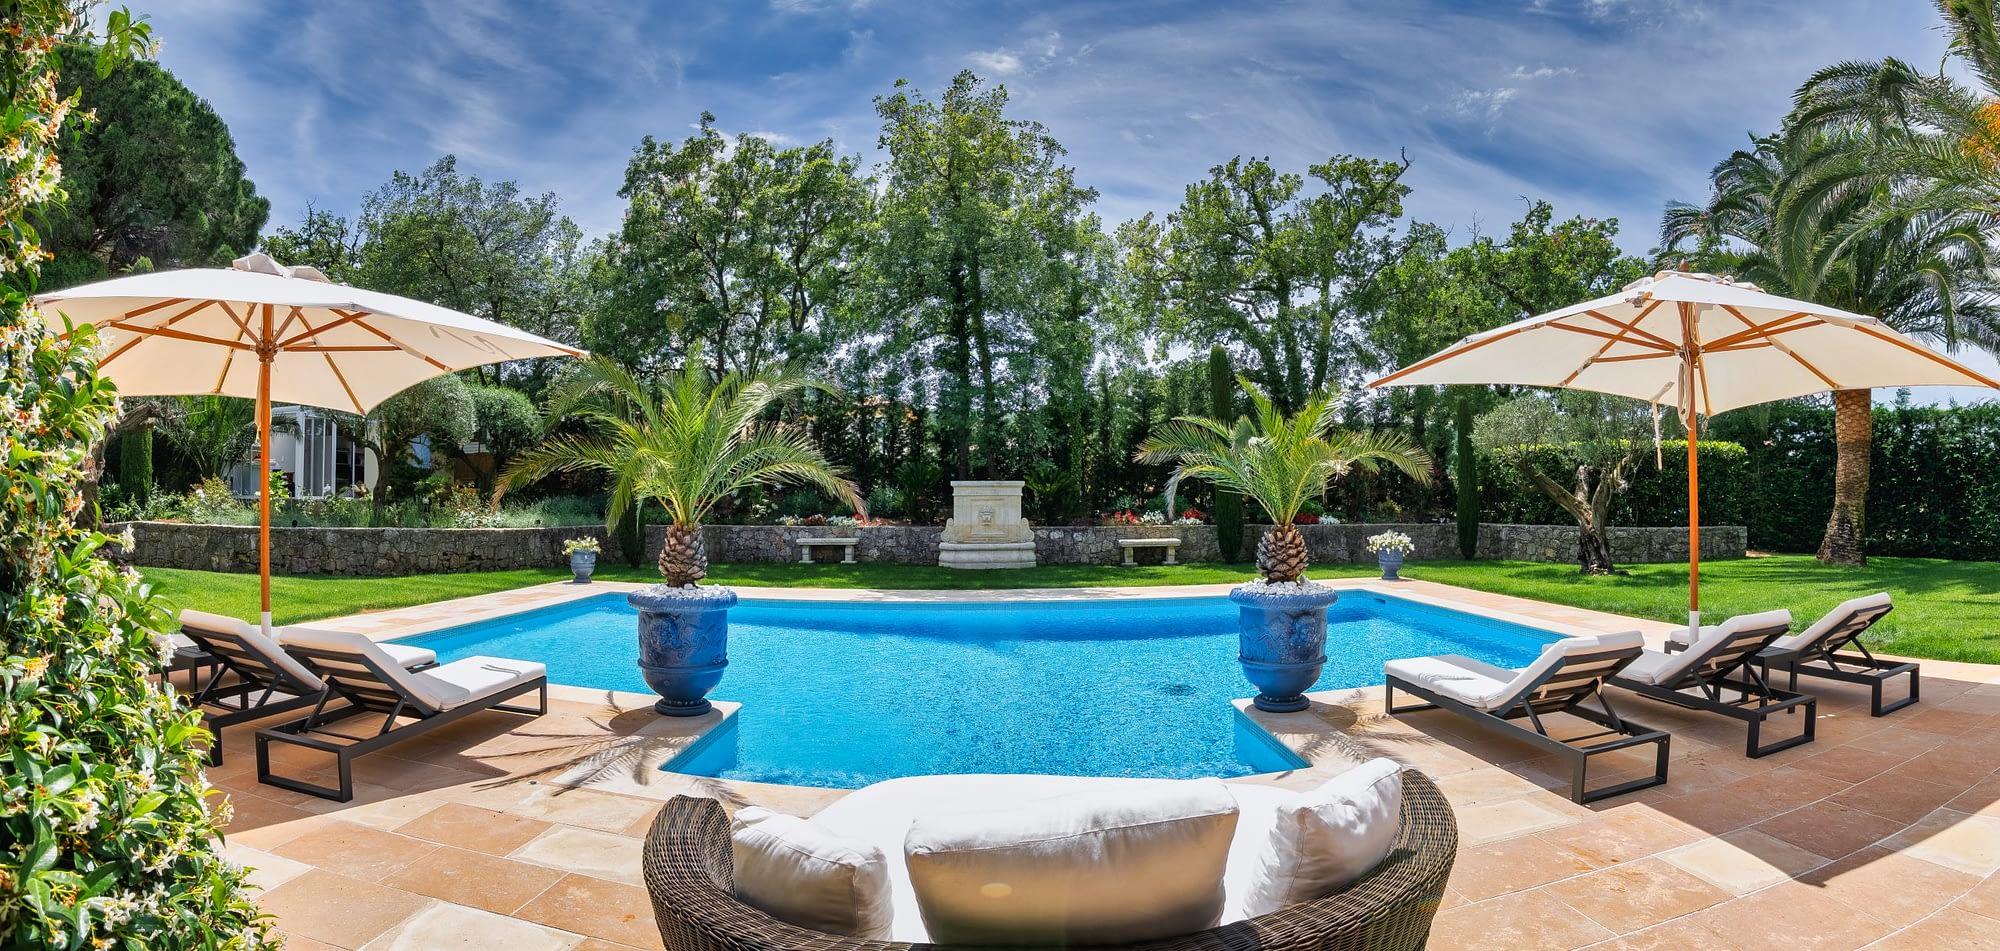 Villa Pearl St Tropez Ultra Luxury Vacation Rental France